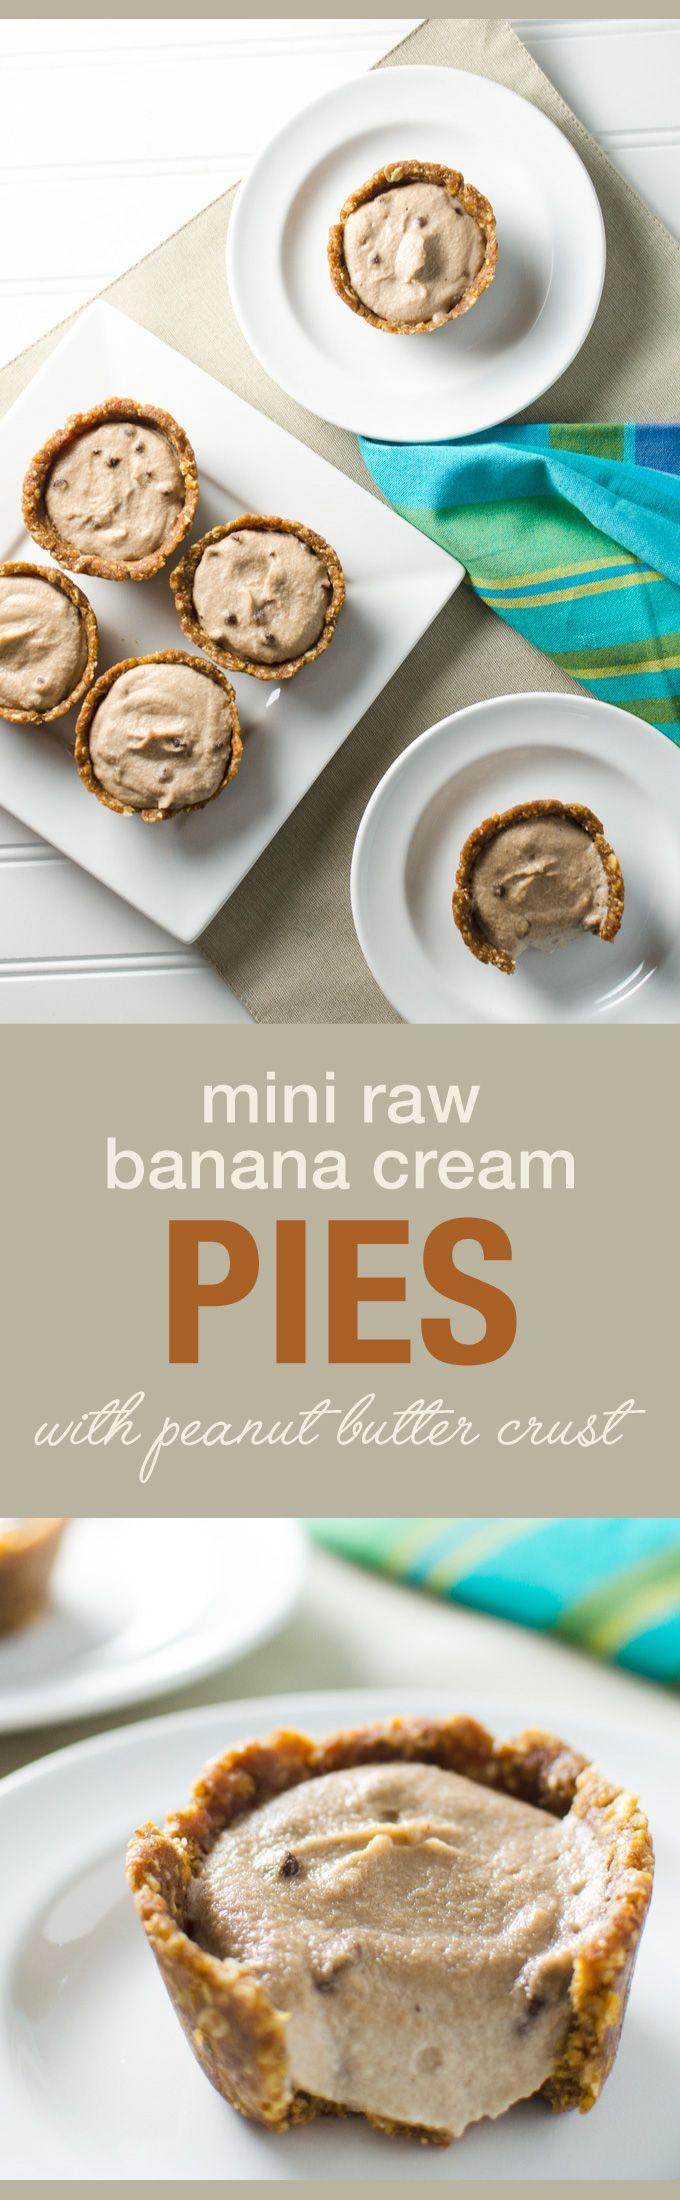 Raw Banana Cream Pies with peanut butter crust